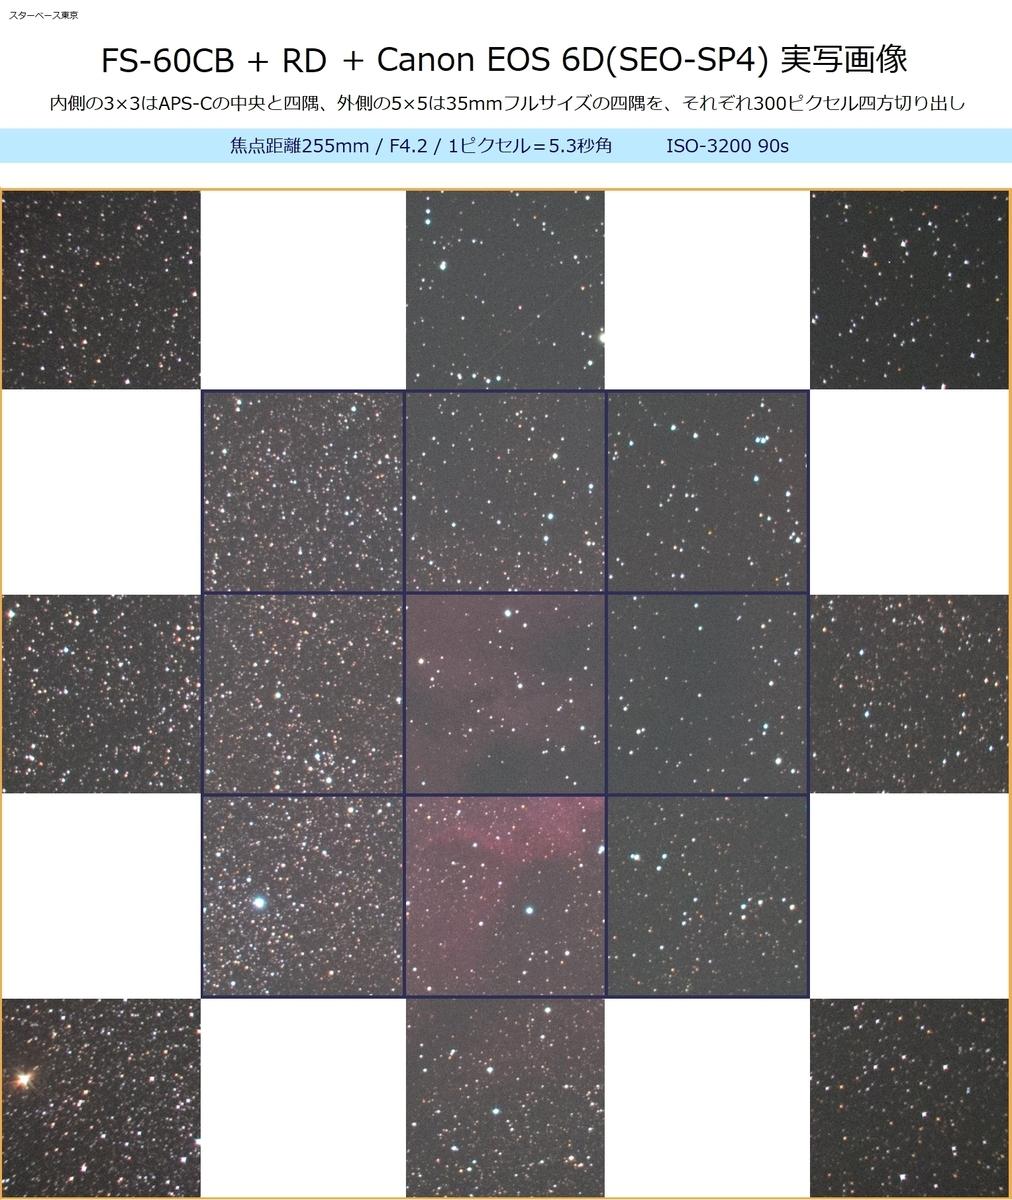 f:id:starbase:20210604132237j:plain